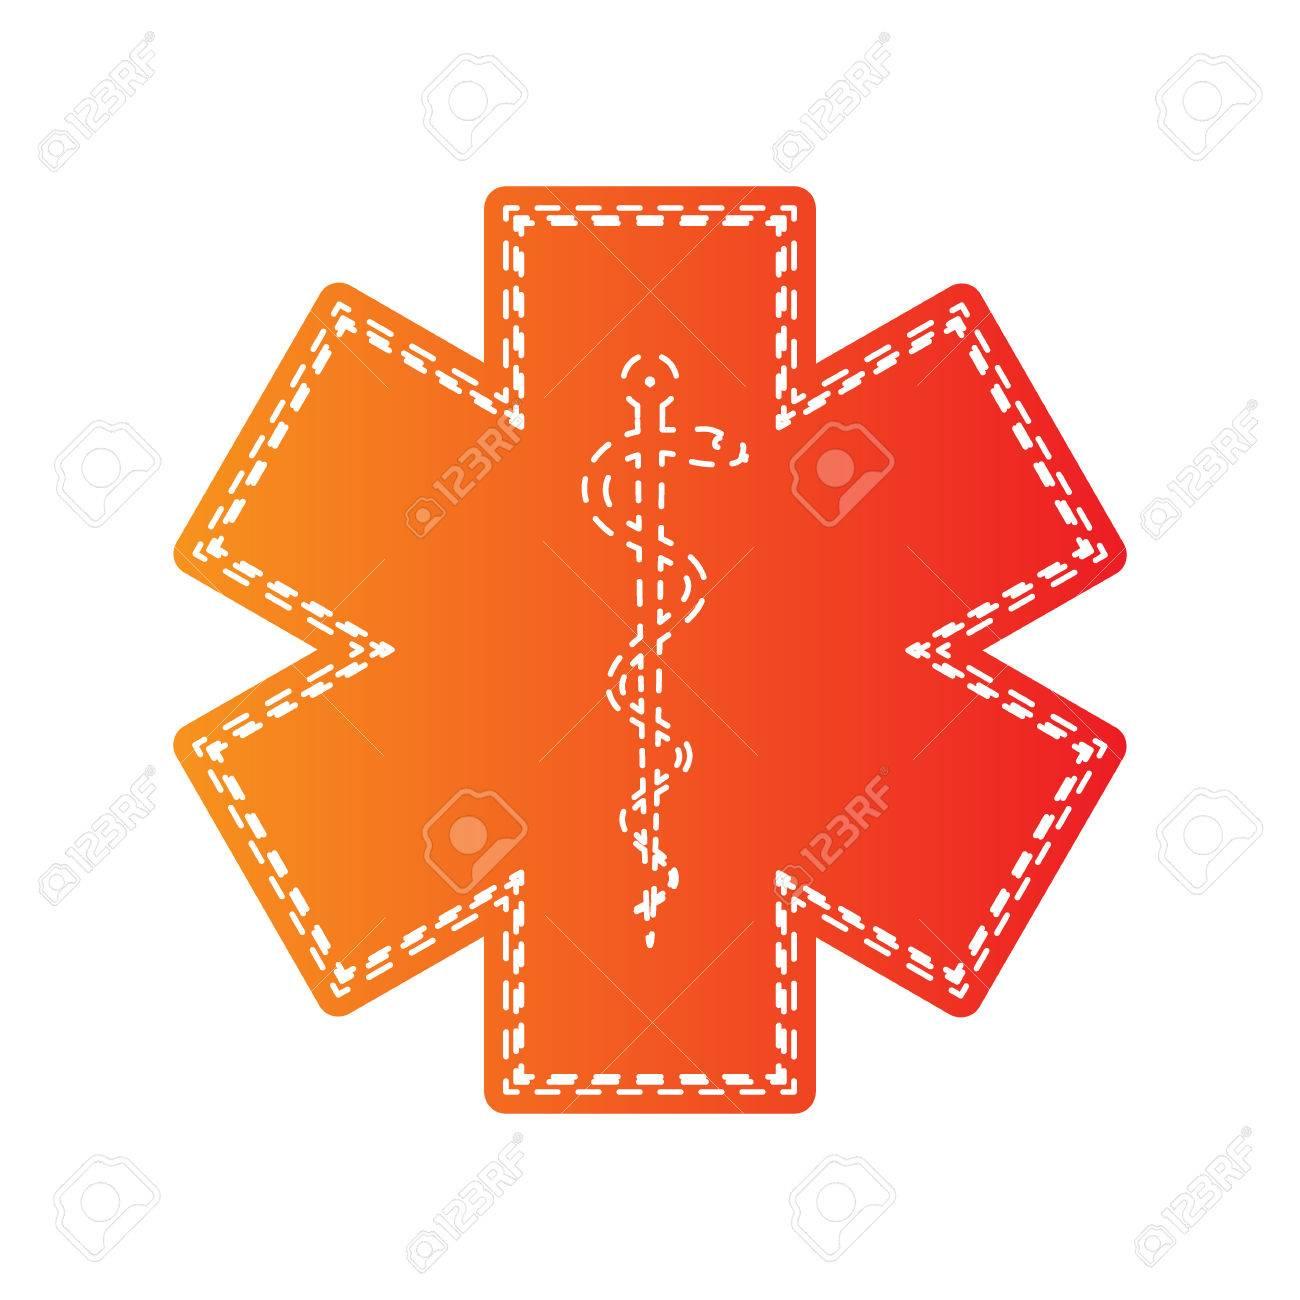 Medical Symbol Of The Emergency Star Of Life Orange Applique